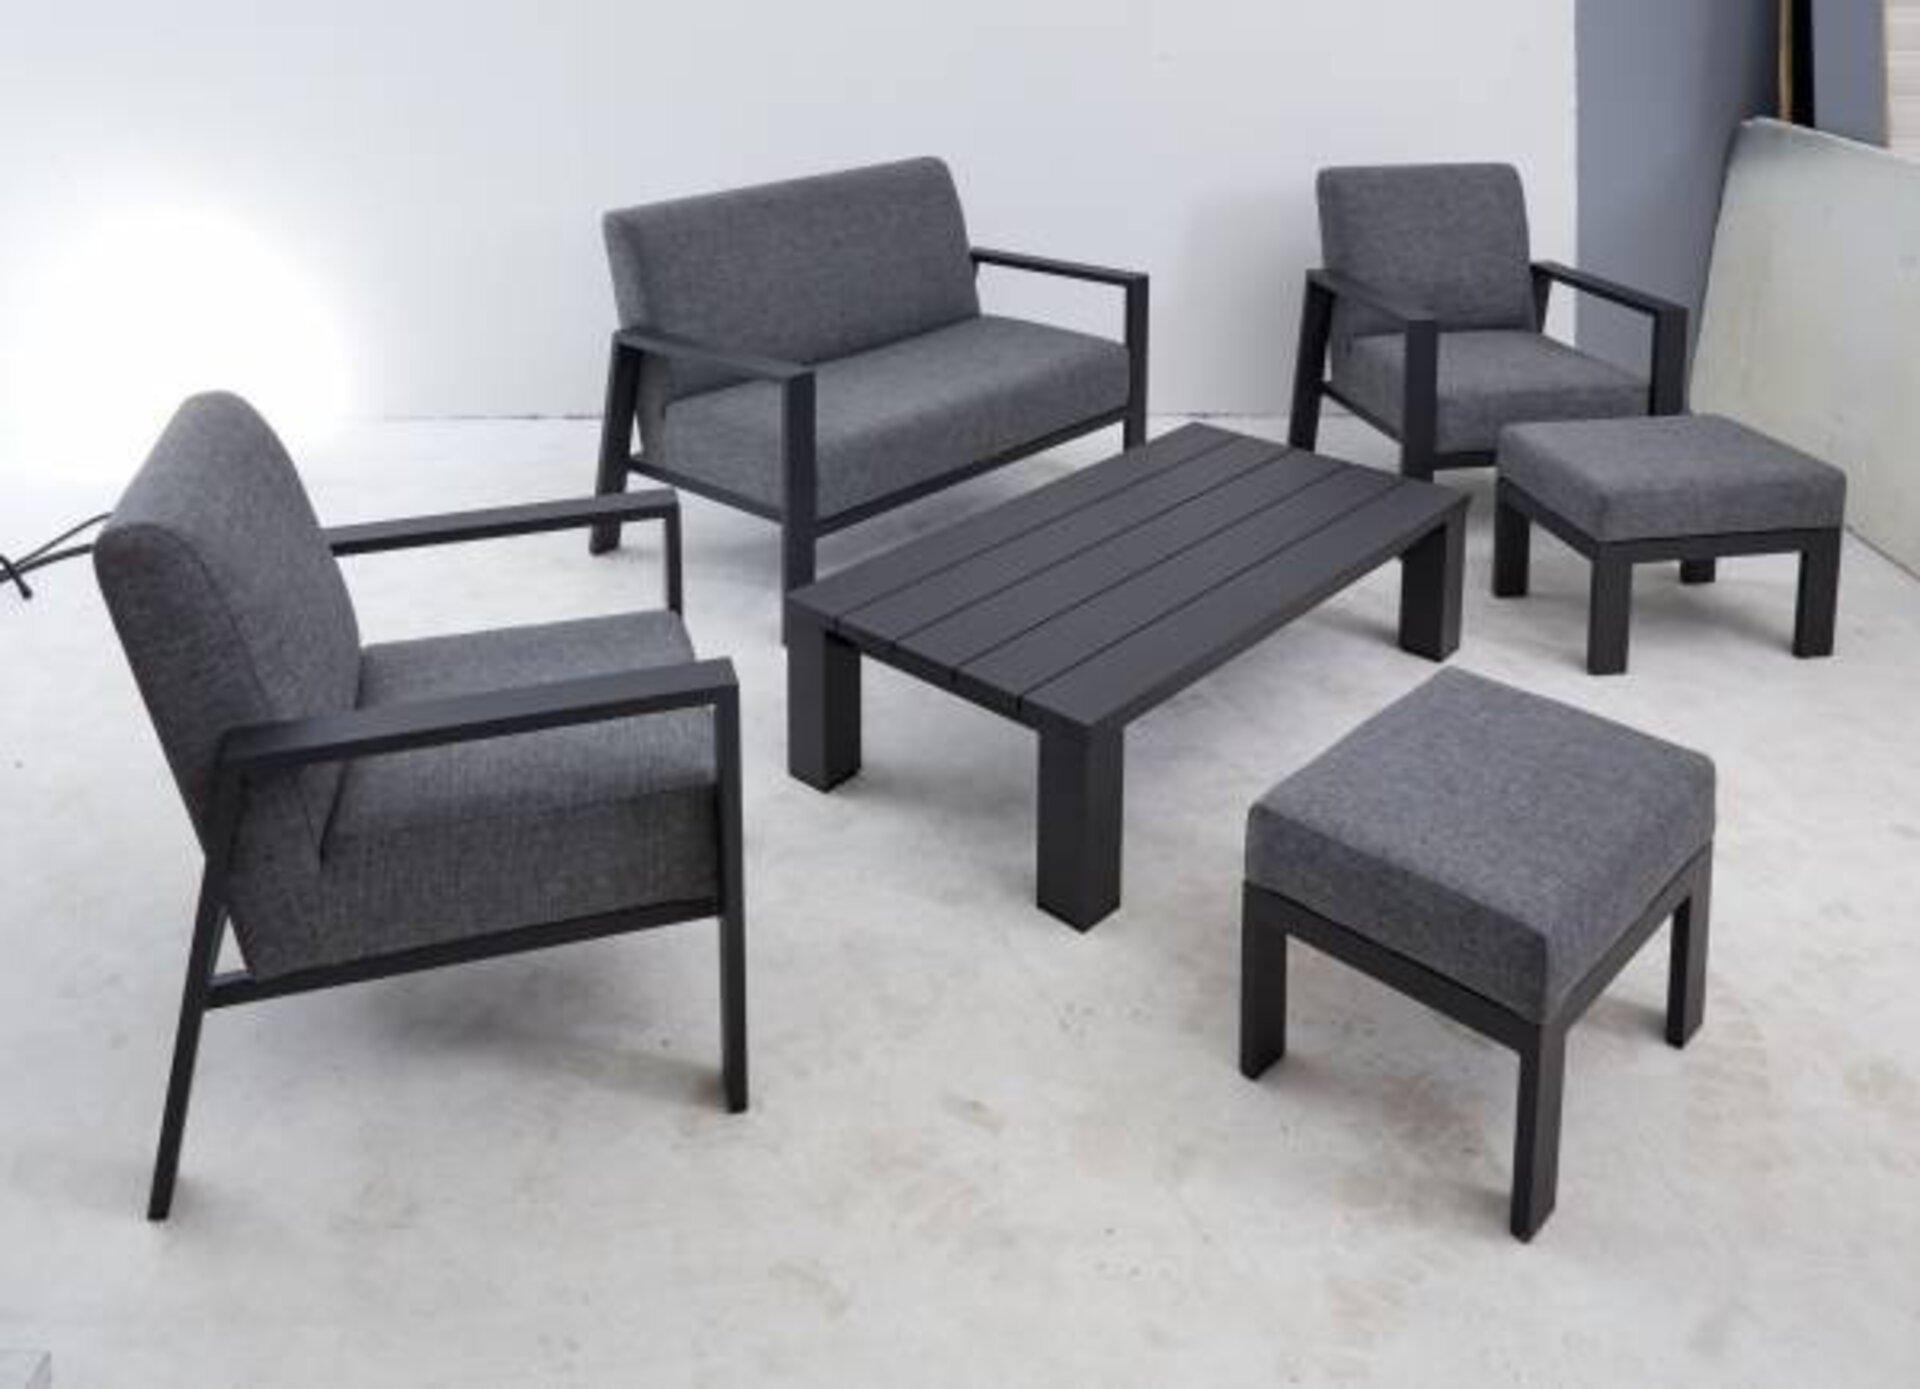 Loungesofa DJERBA Outdoor Textil 92 x 79 x 136 cm